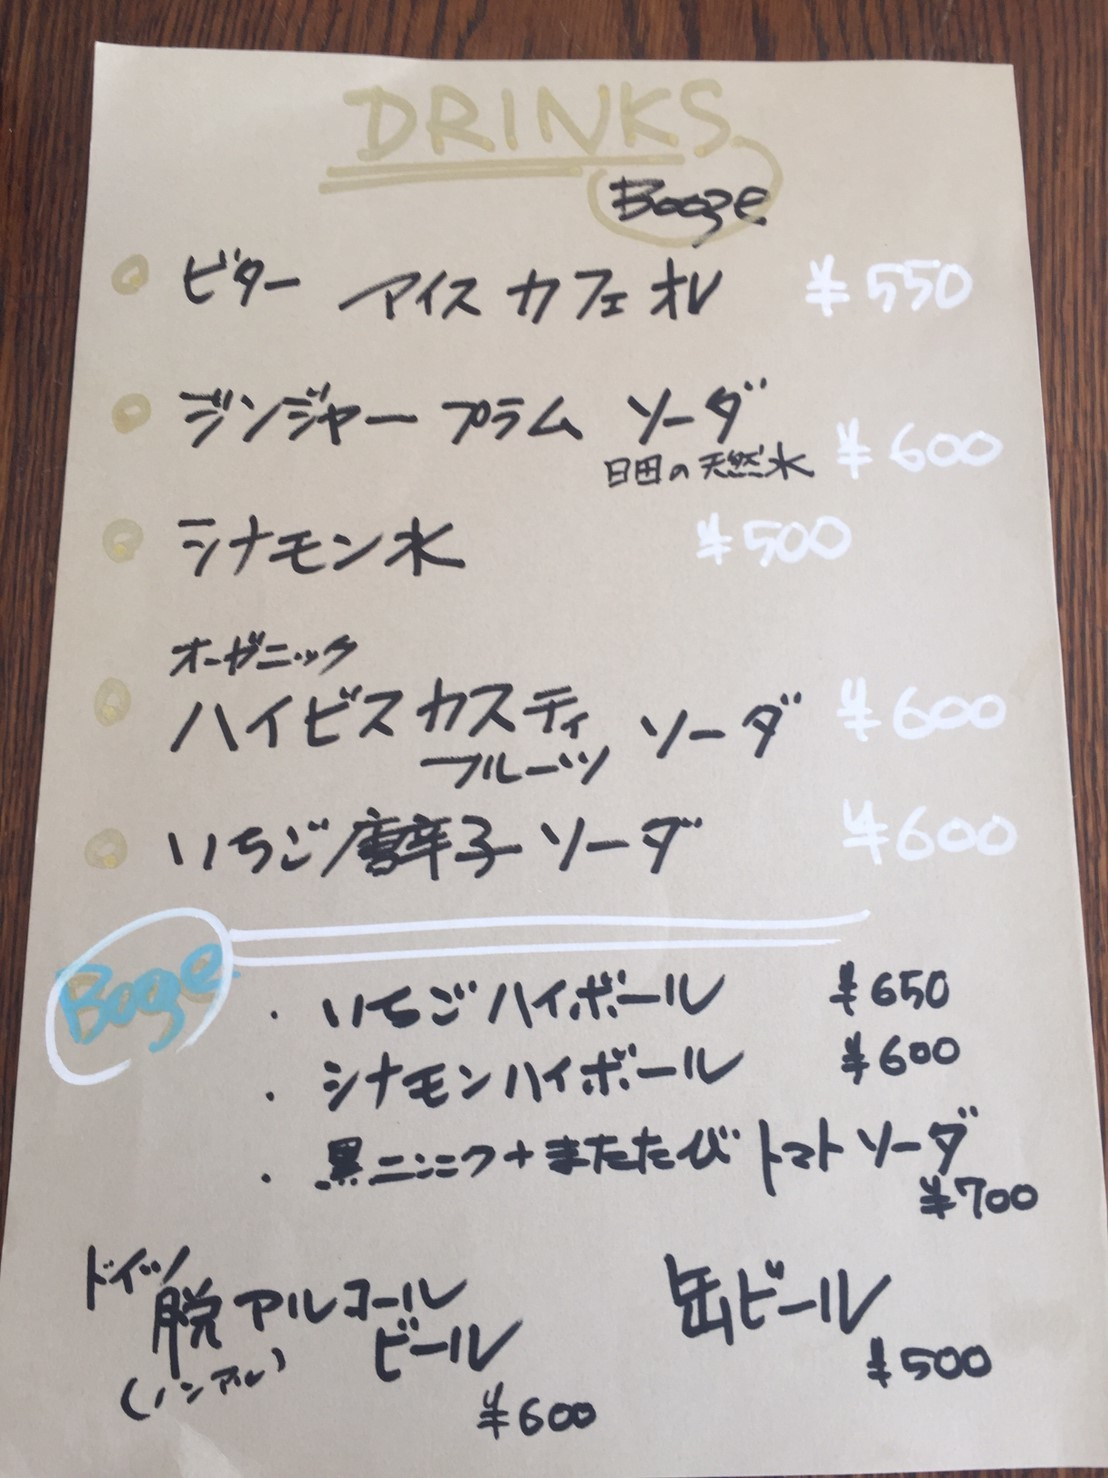 Tottori カルマ  カルマ焼飯_e0115904_22244654.jpg